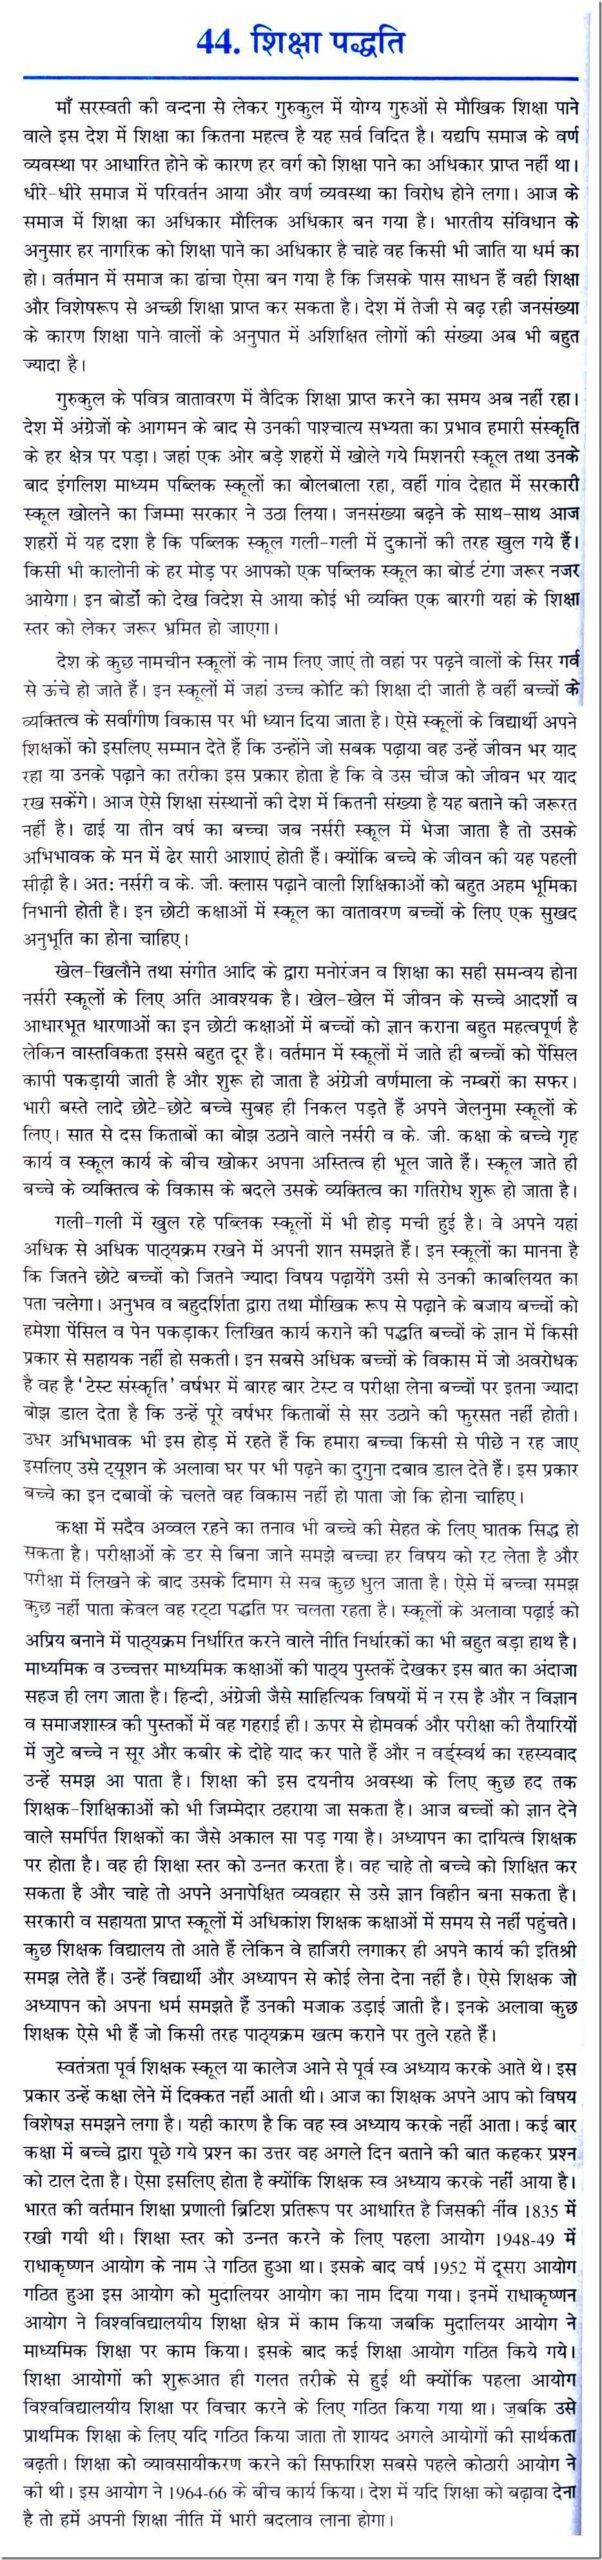 siksha-praddhati-hindi-essay